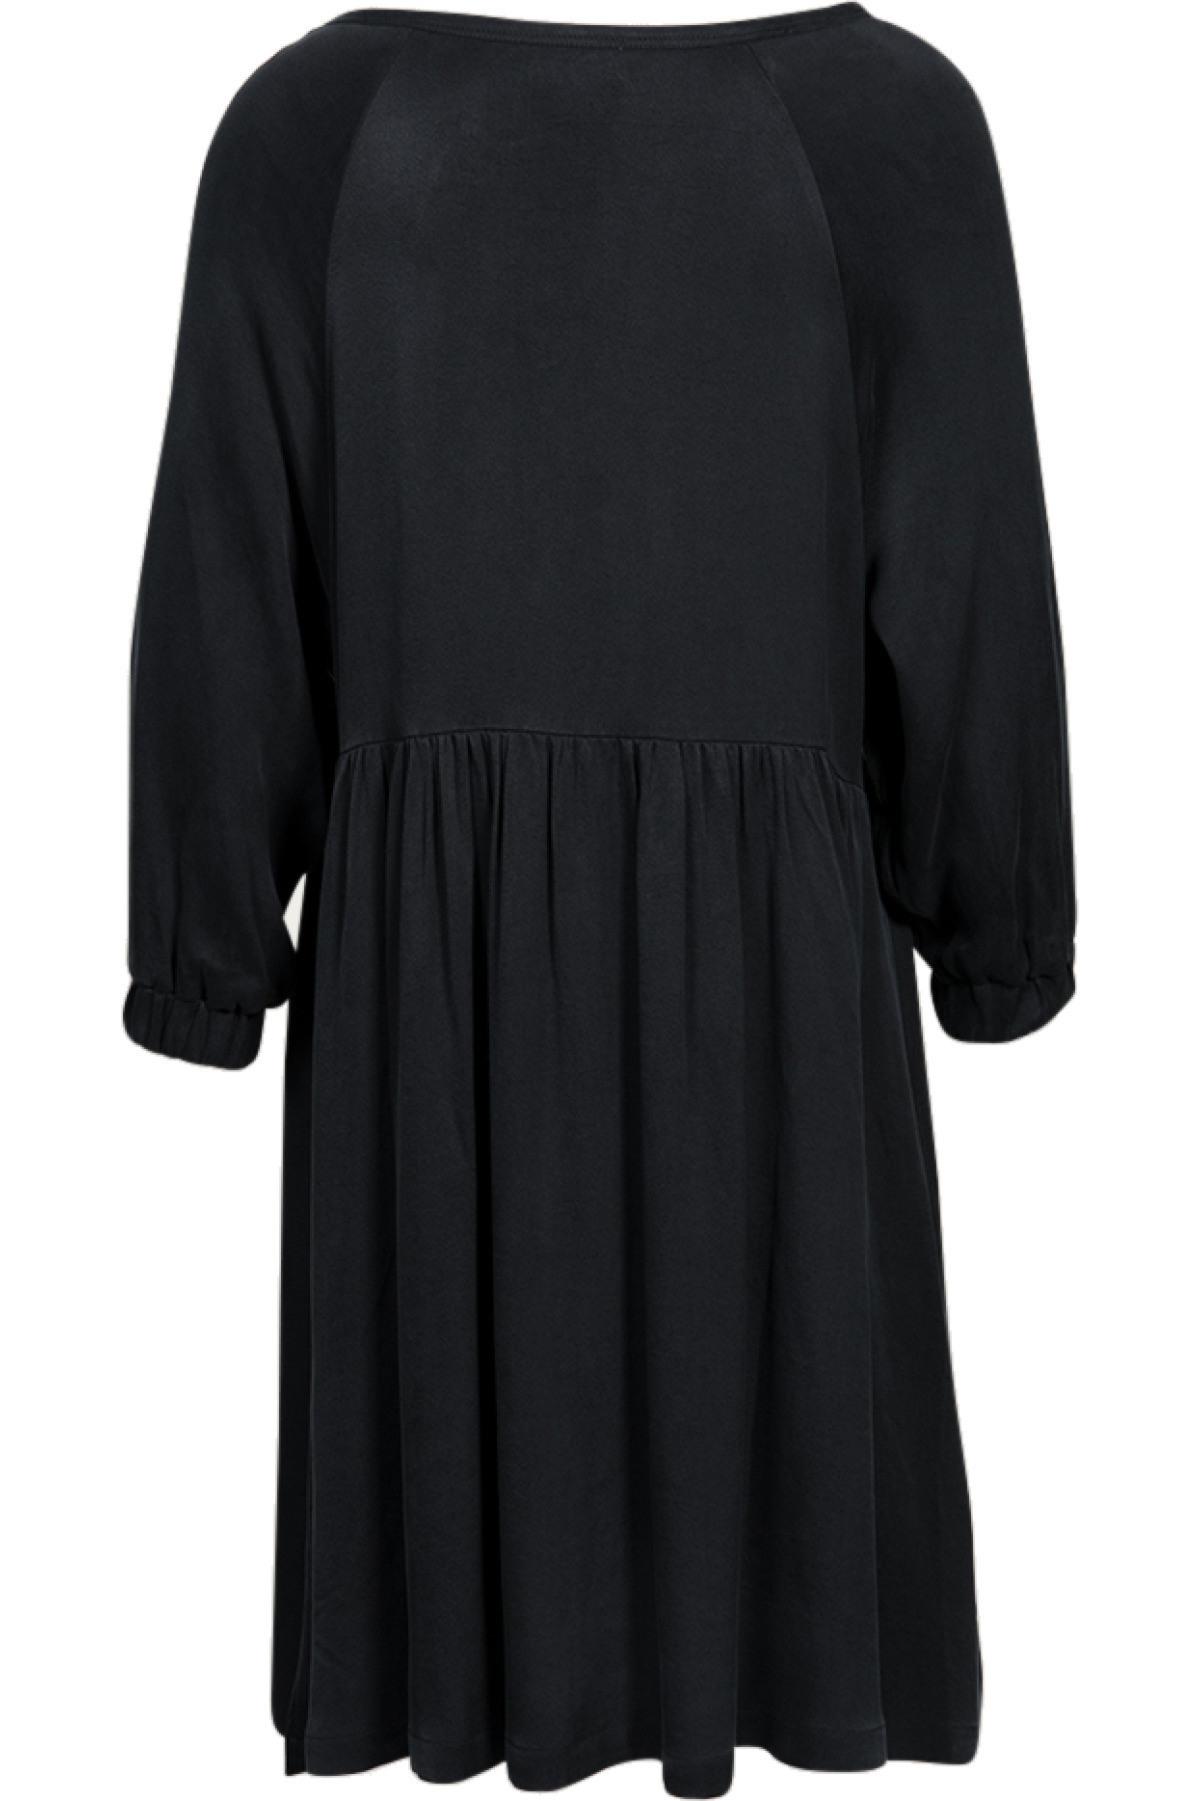 American Vintage Kleid Ipi In Schwarz 426930  Greta  Luis